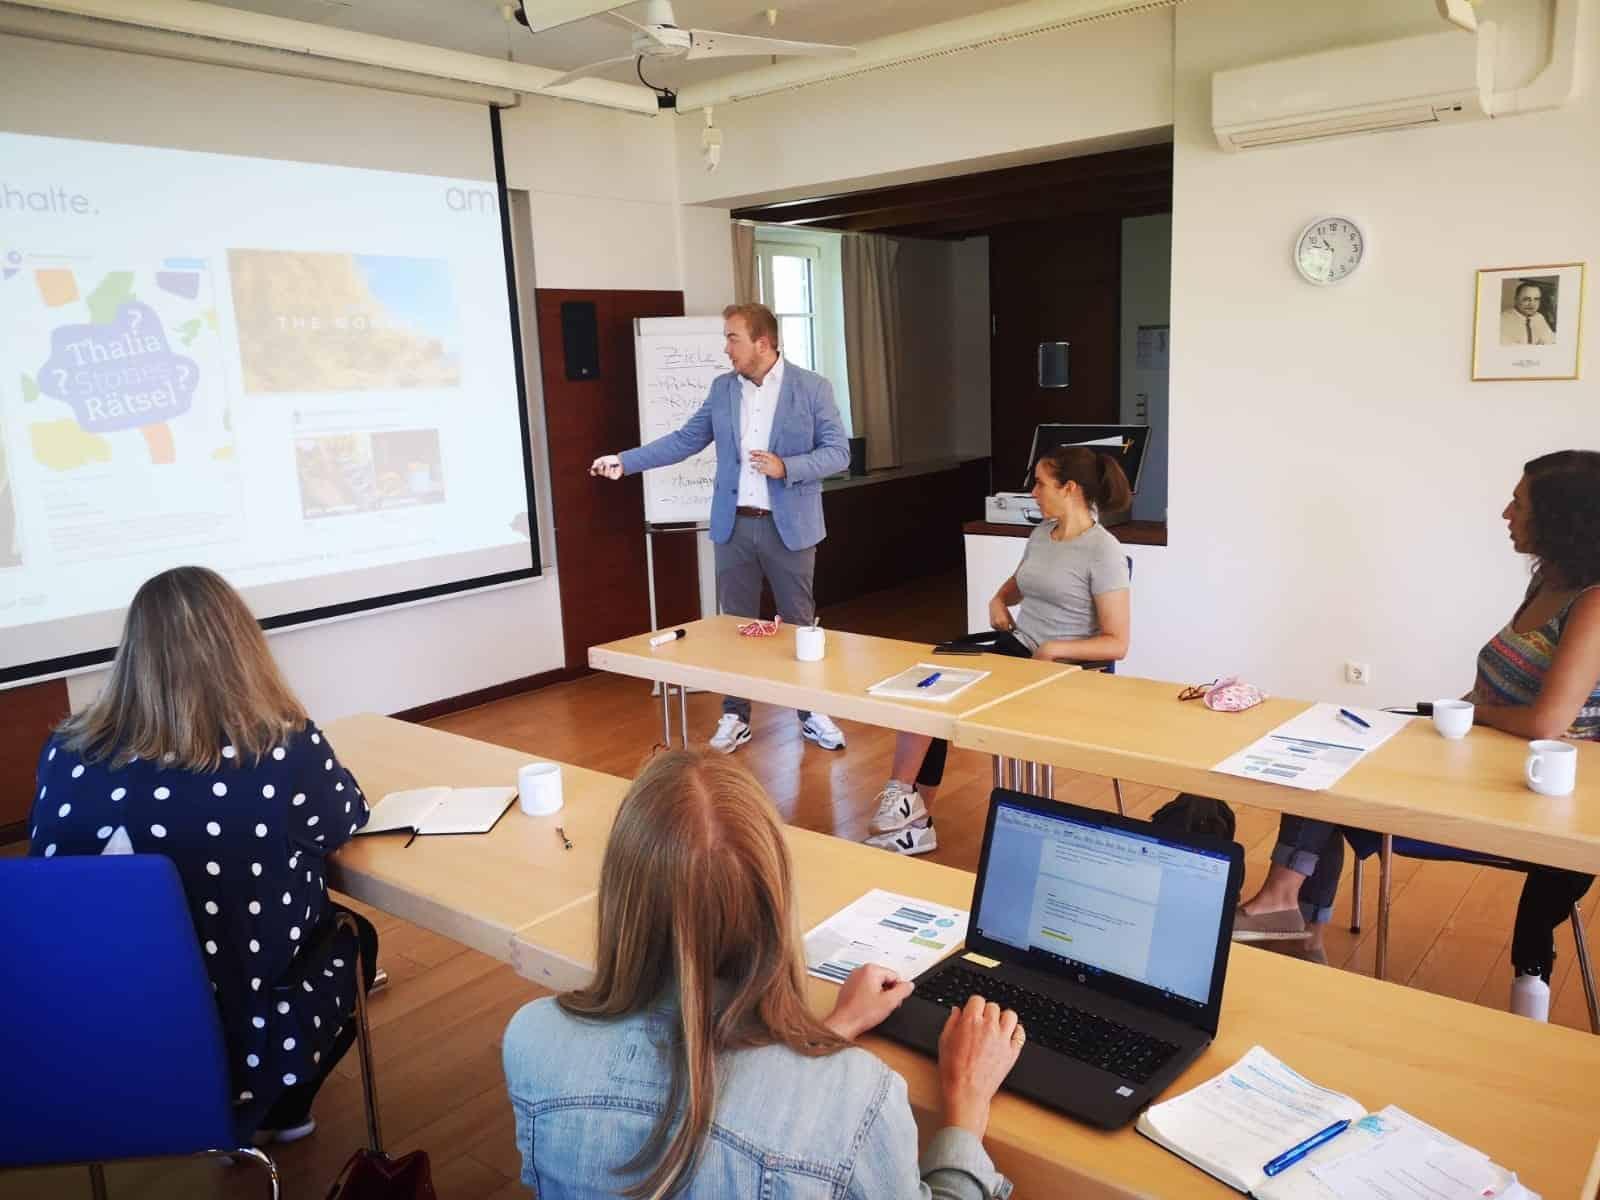 Benjamin Desche SEO und Social Media Coaching auf Schloss Aspenstein